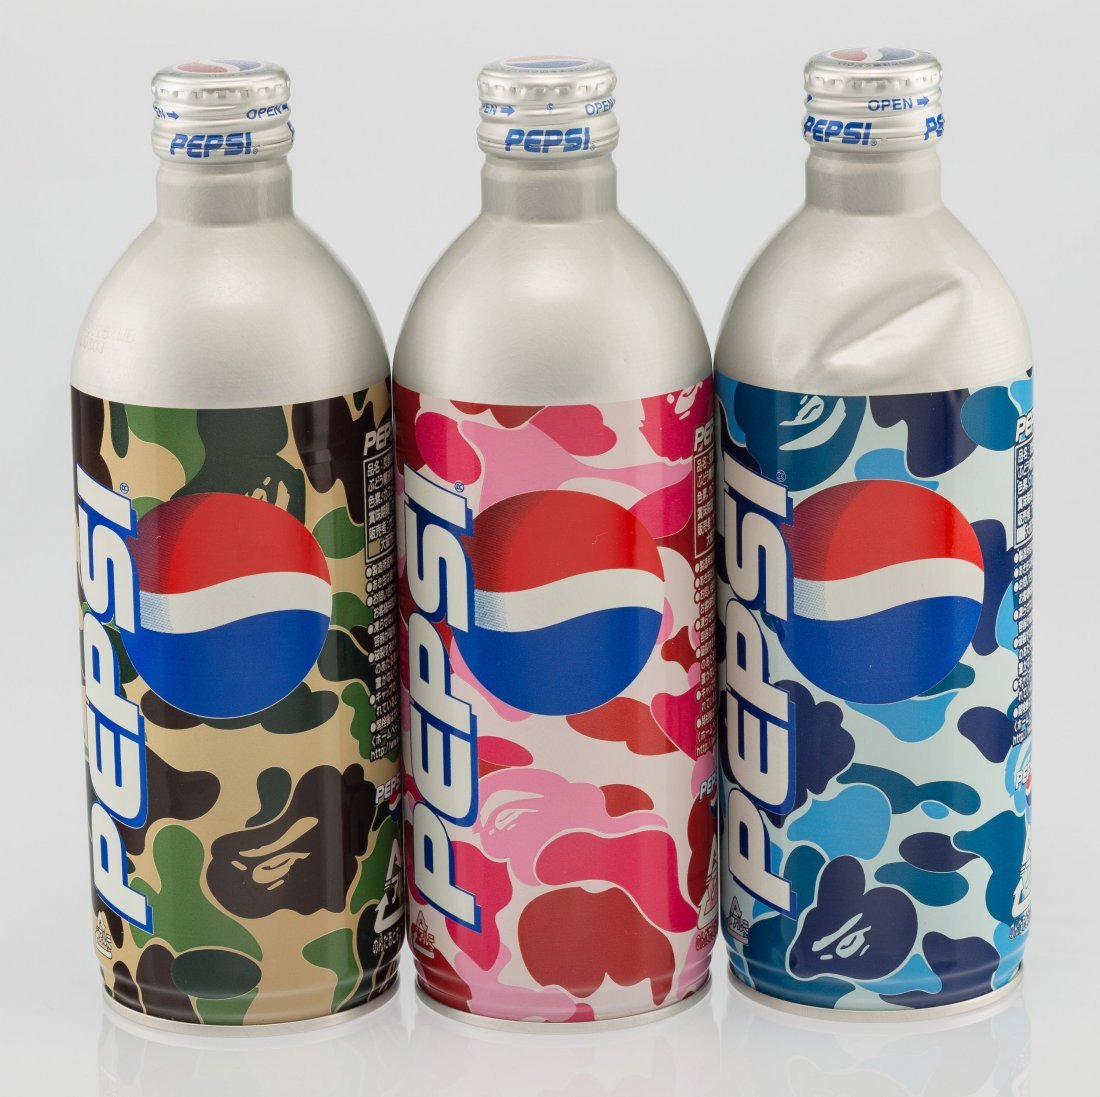 14084: BAPE X Pepsi Set of Three Pepsi Bottles, c. 2002